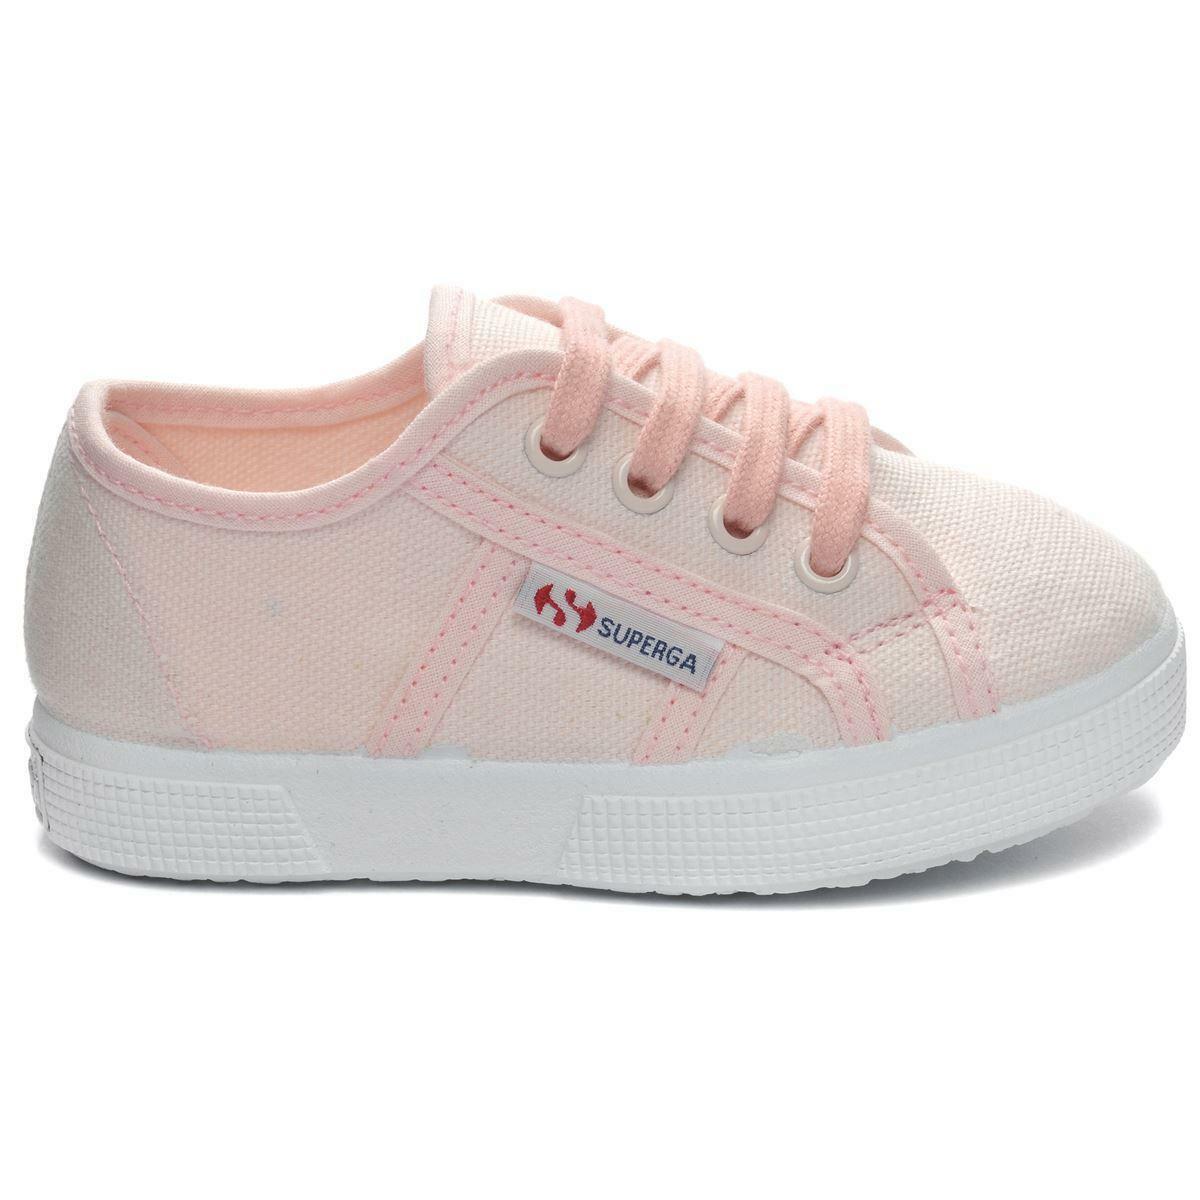 superga superga sneakers bambina 2750 torchietto rosa